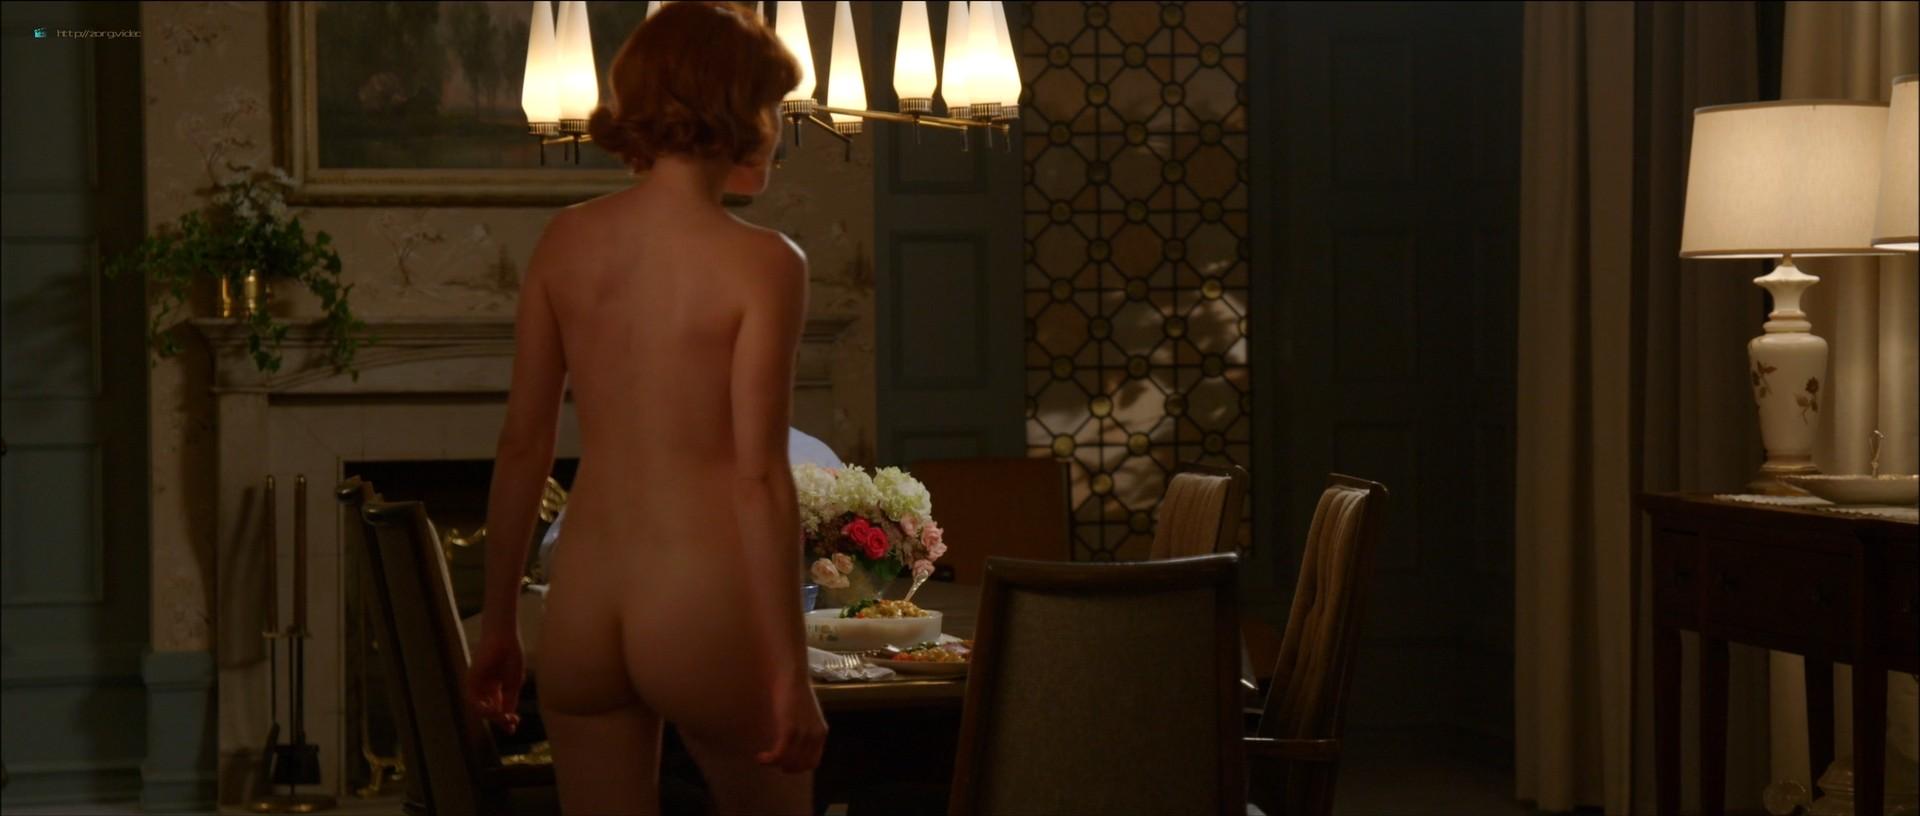 Ginnifer Goodwin Nude Butt Alexandra Daddario And Others -4993